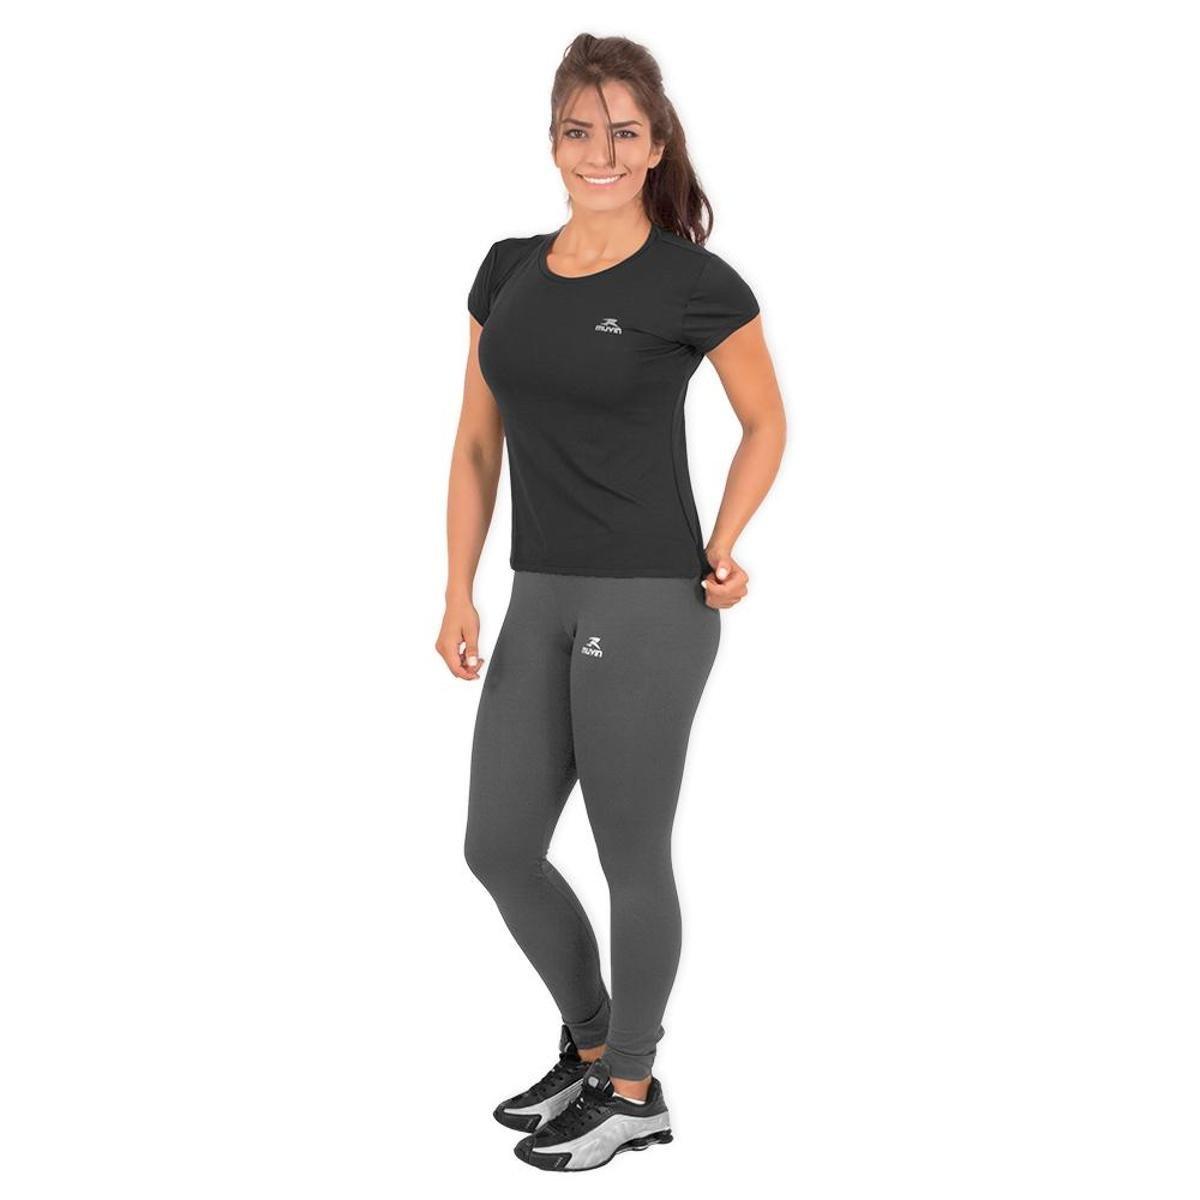 Preto G1 Running 200 CSR Camiseta Poliamida 50 Performance UV SS wzzdHE